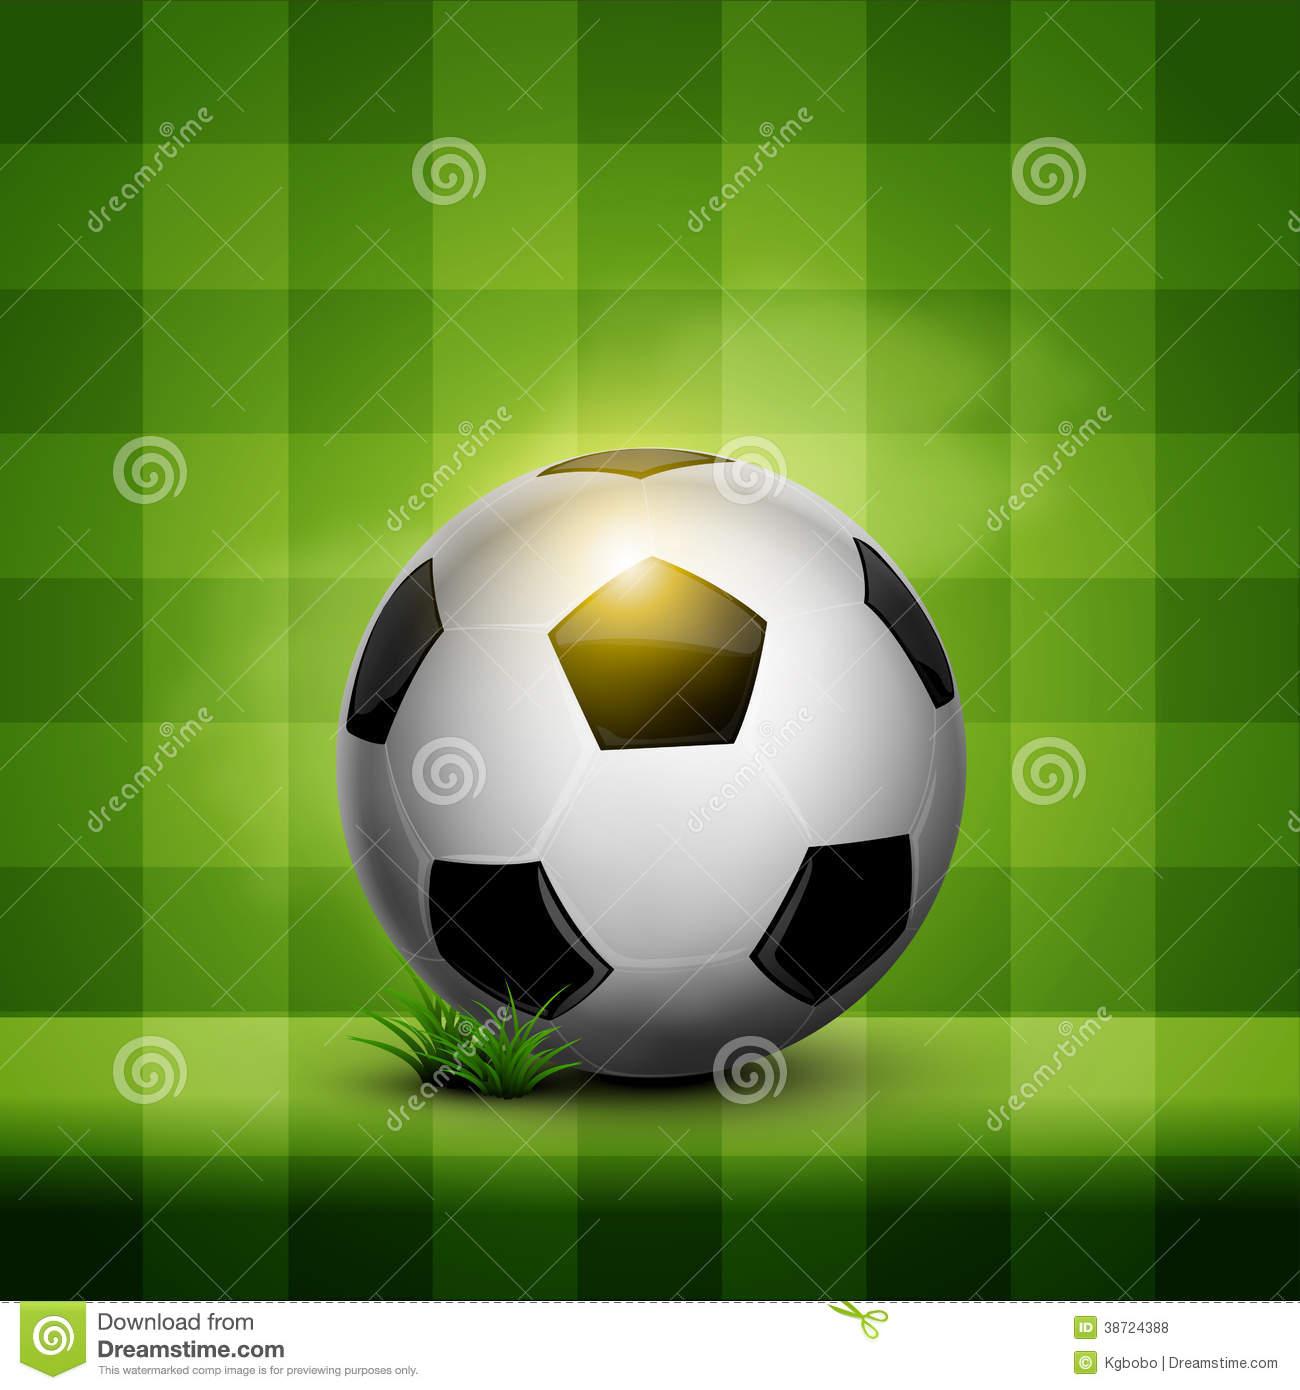 Cool Green Soccer Ball Wallpapers